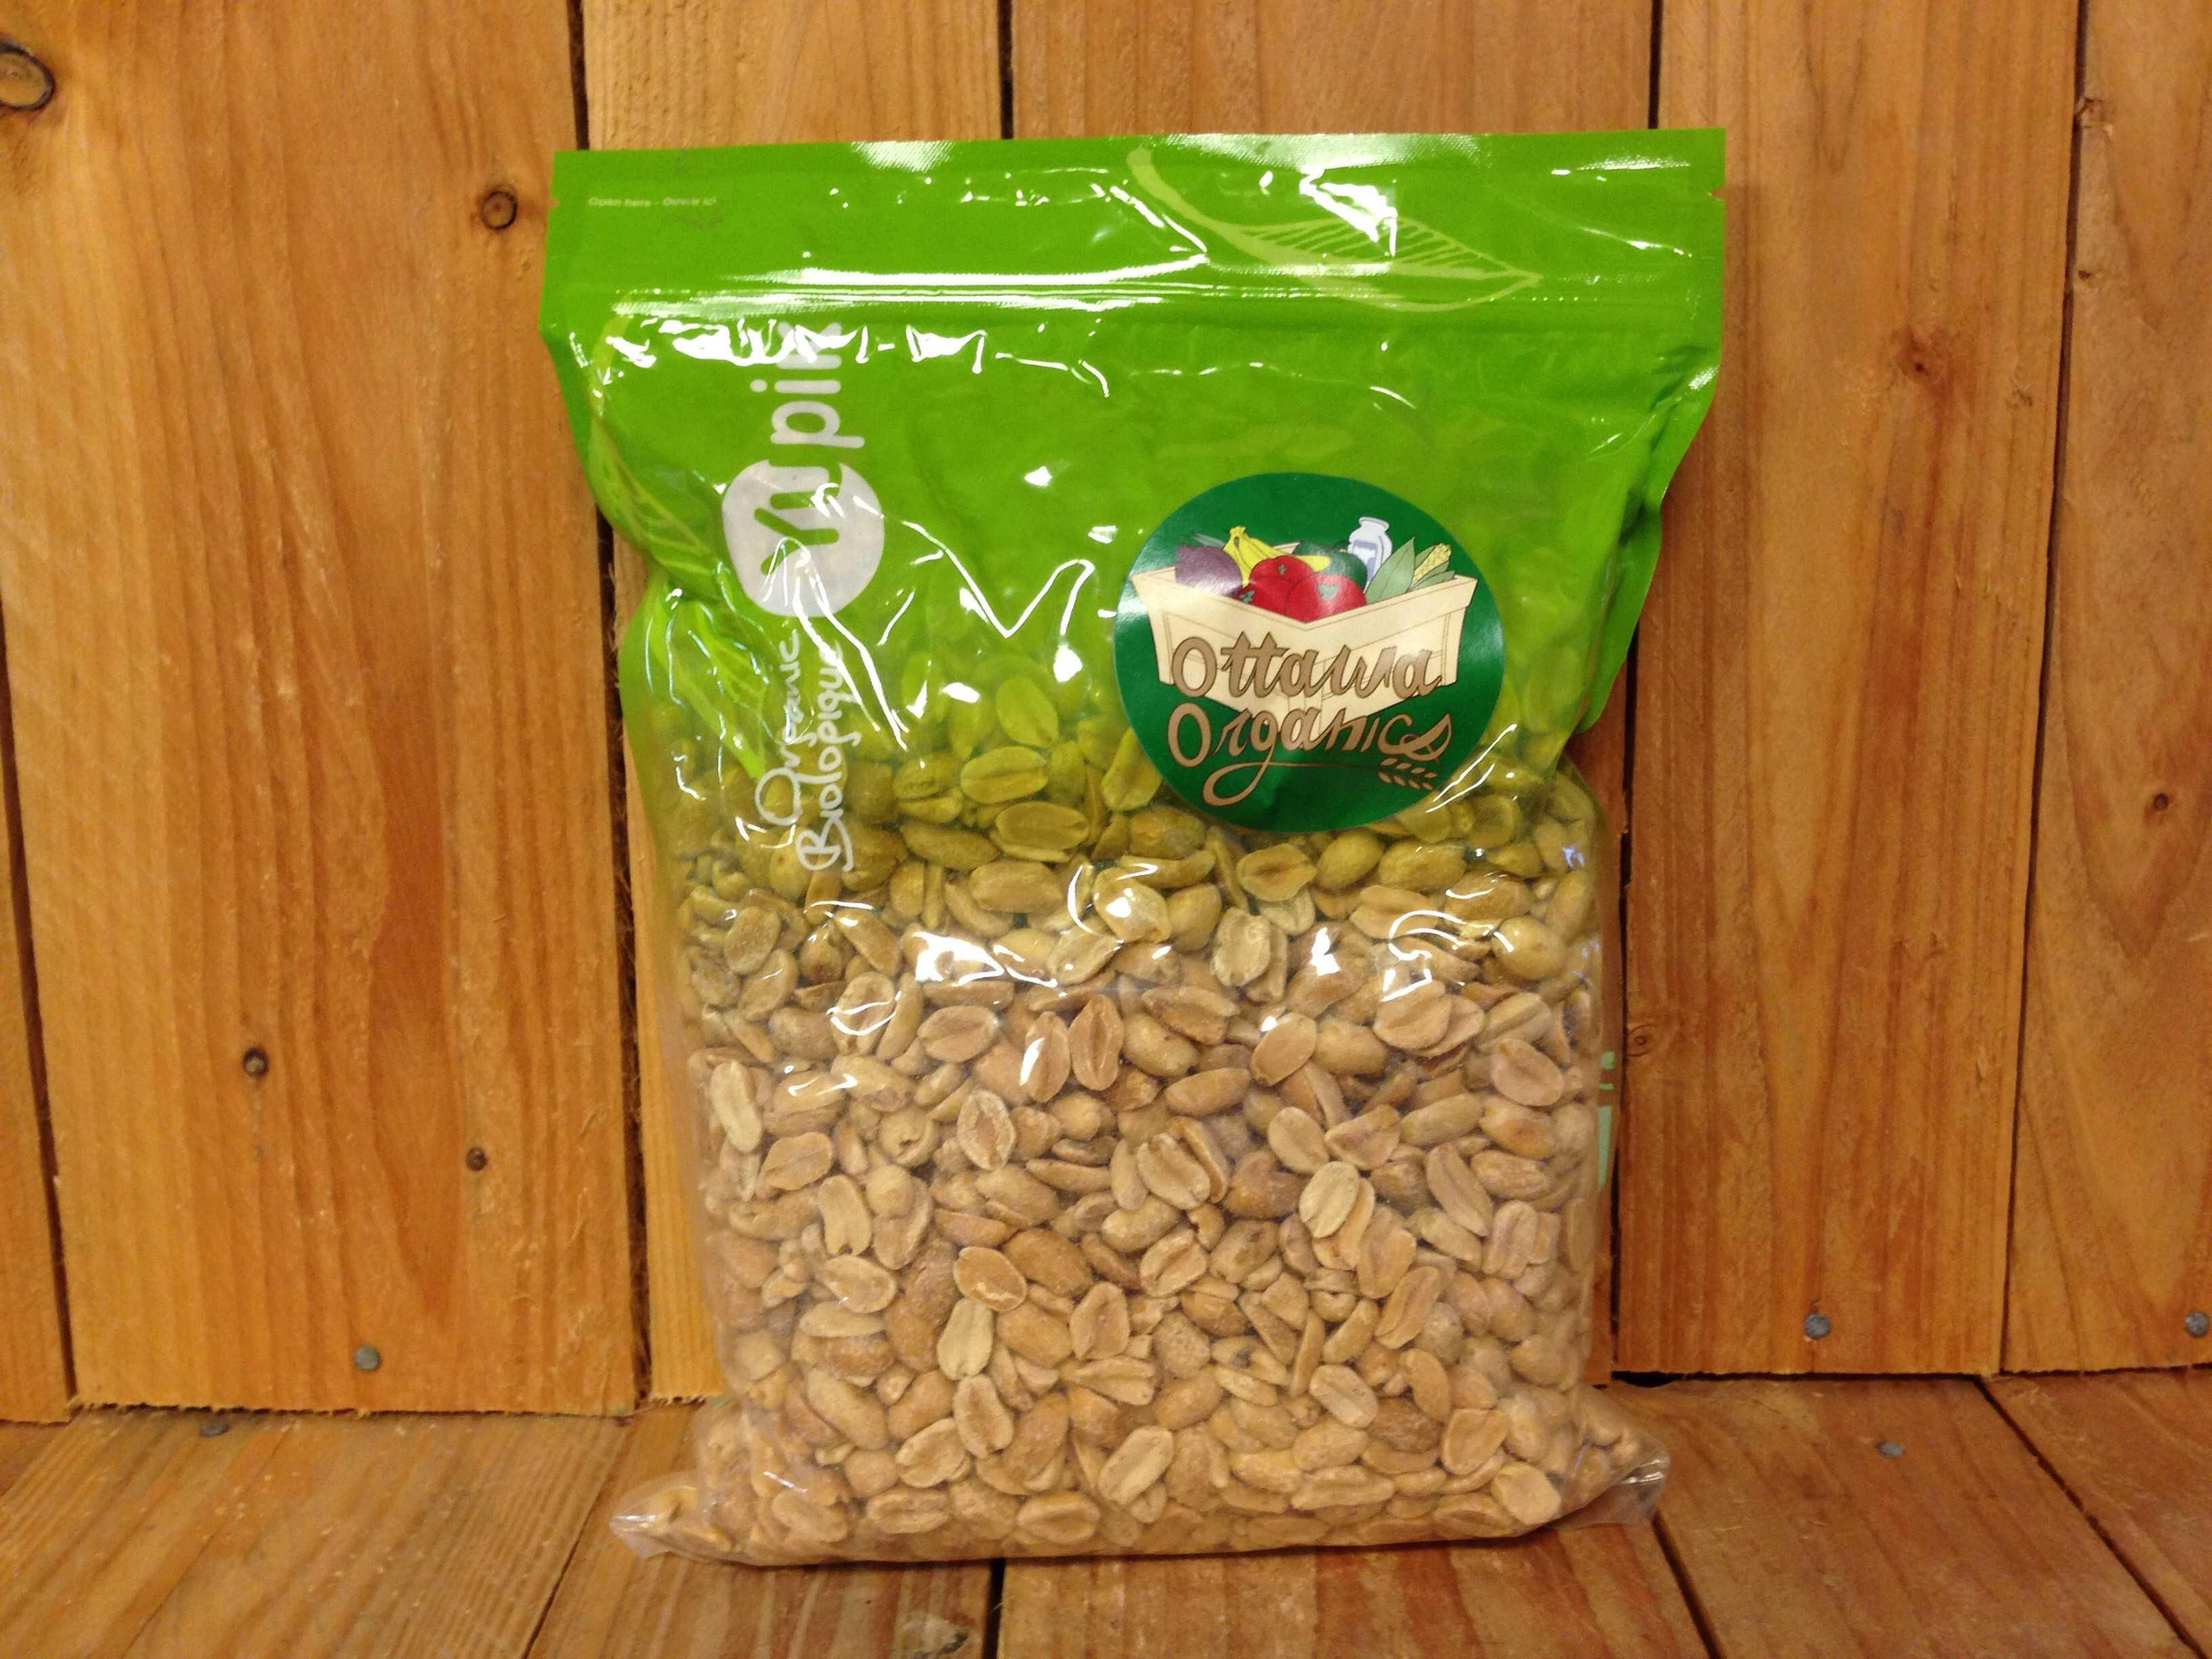 Yupik – Organic Dry Split Peanuts (1kg)